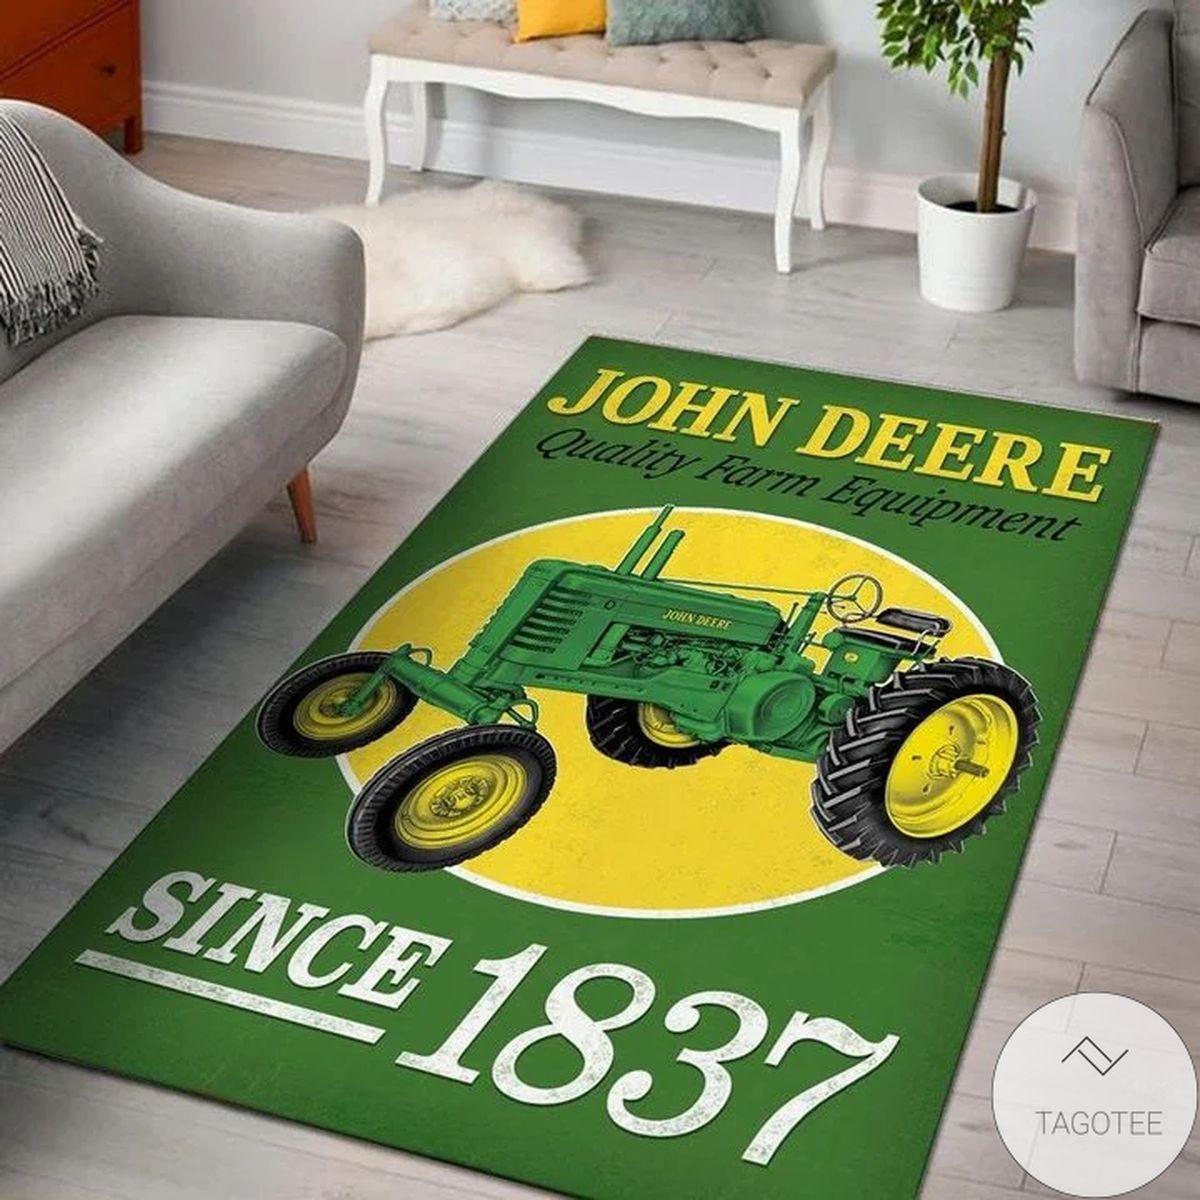 John Deere Quality Farm Equipment Since 1837 3d Rug